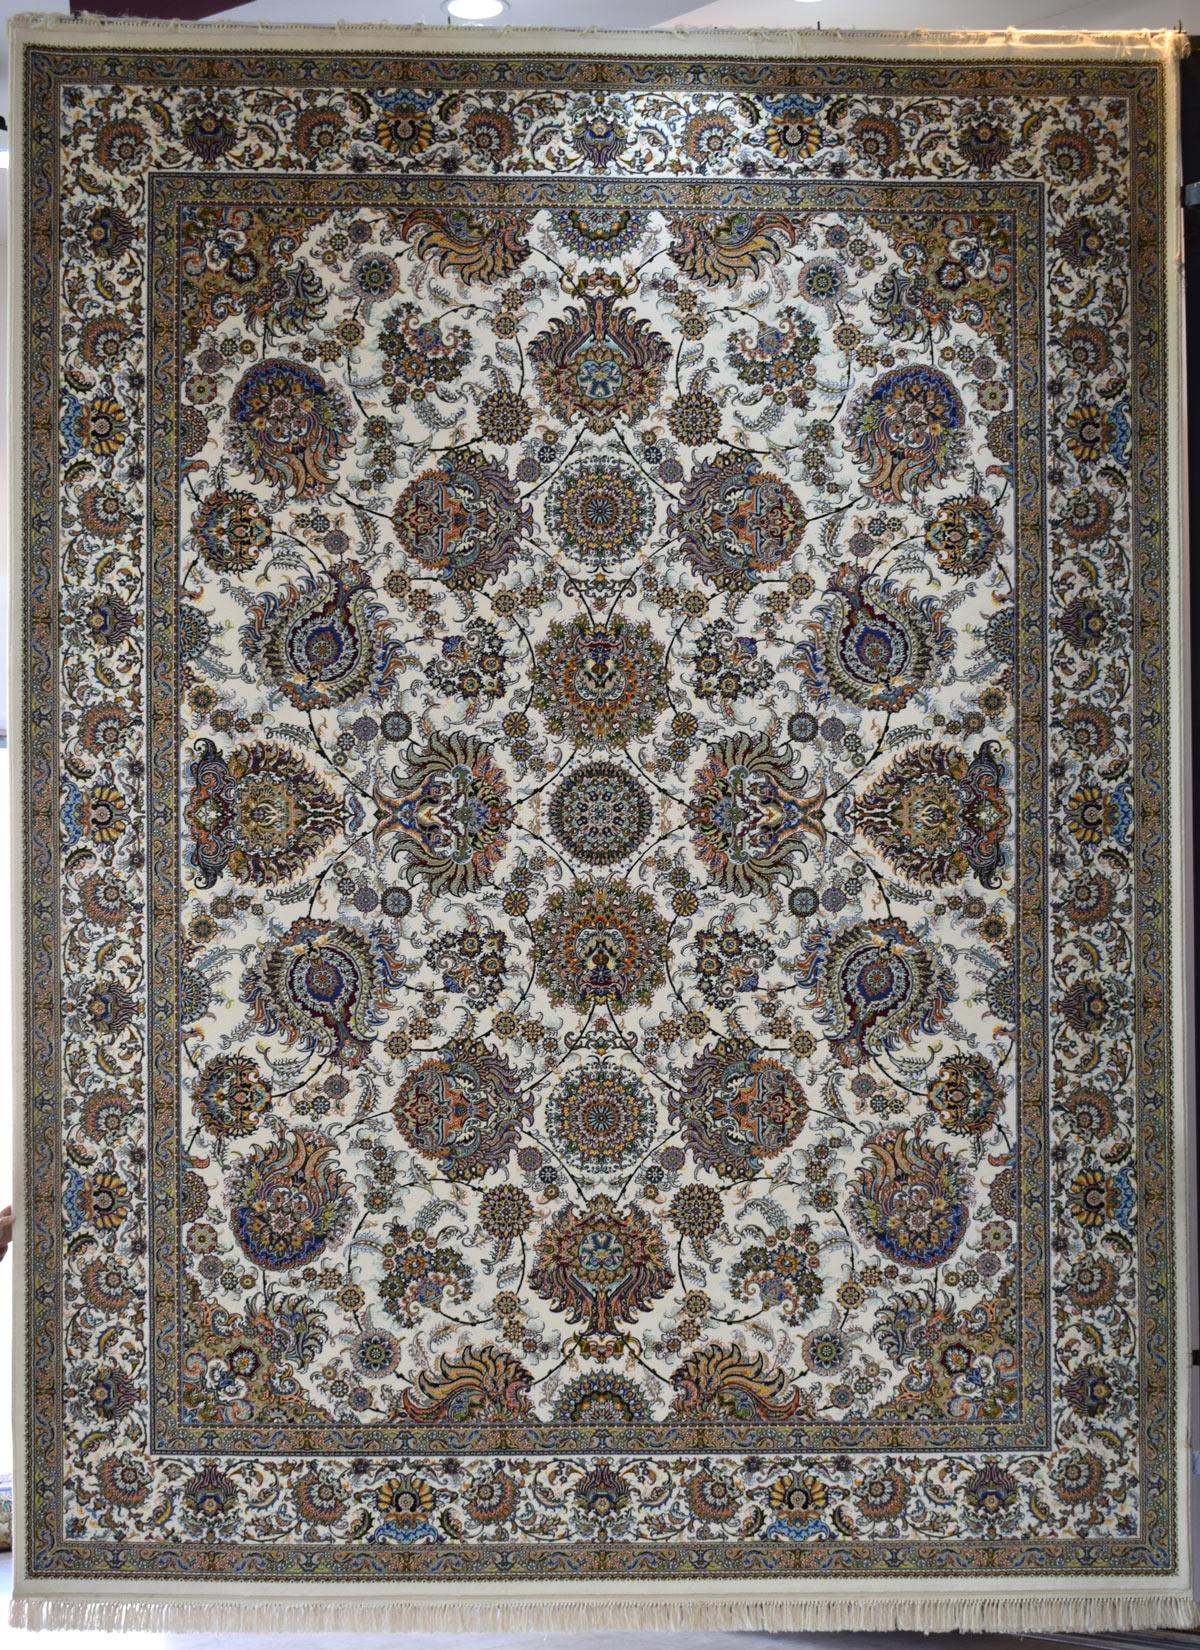 فرش کاشان طرح باغ بهشت ۷۰۰ شانه